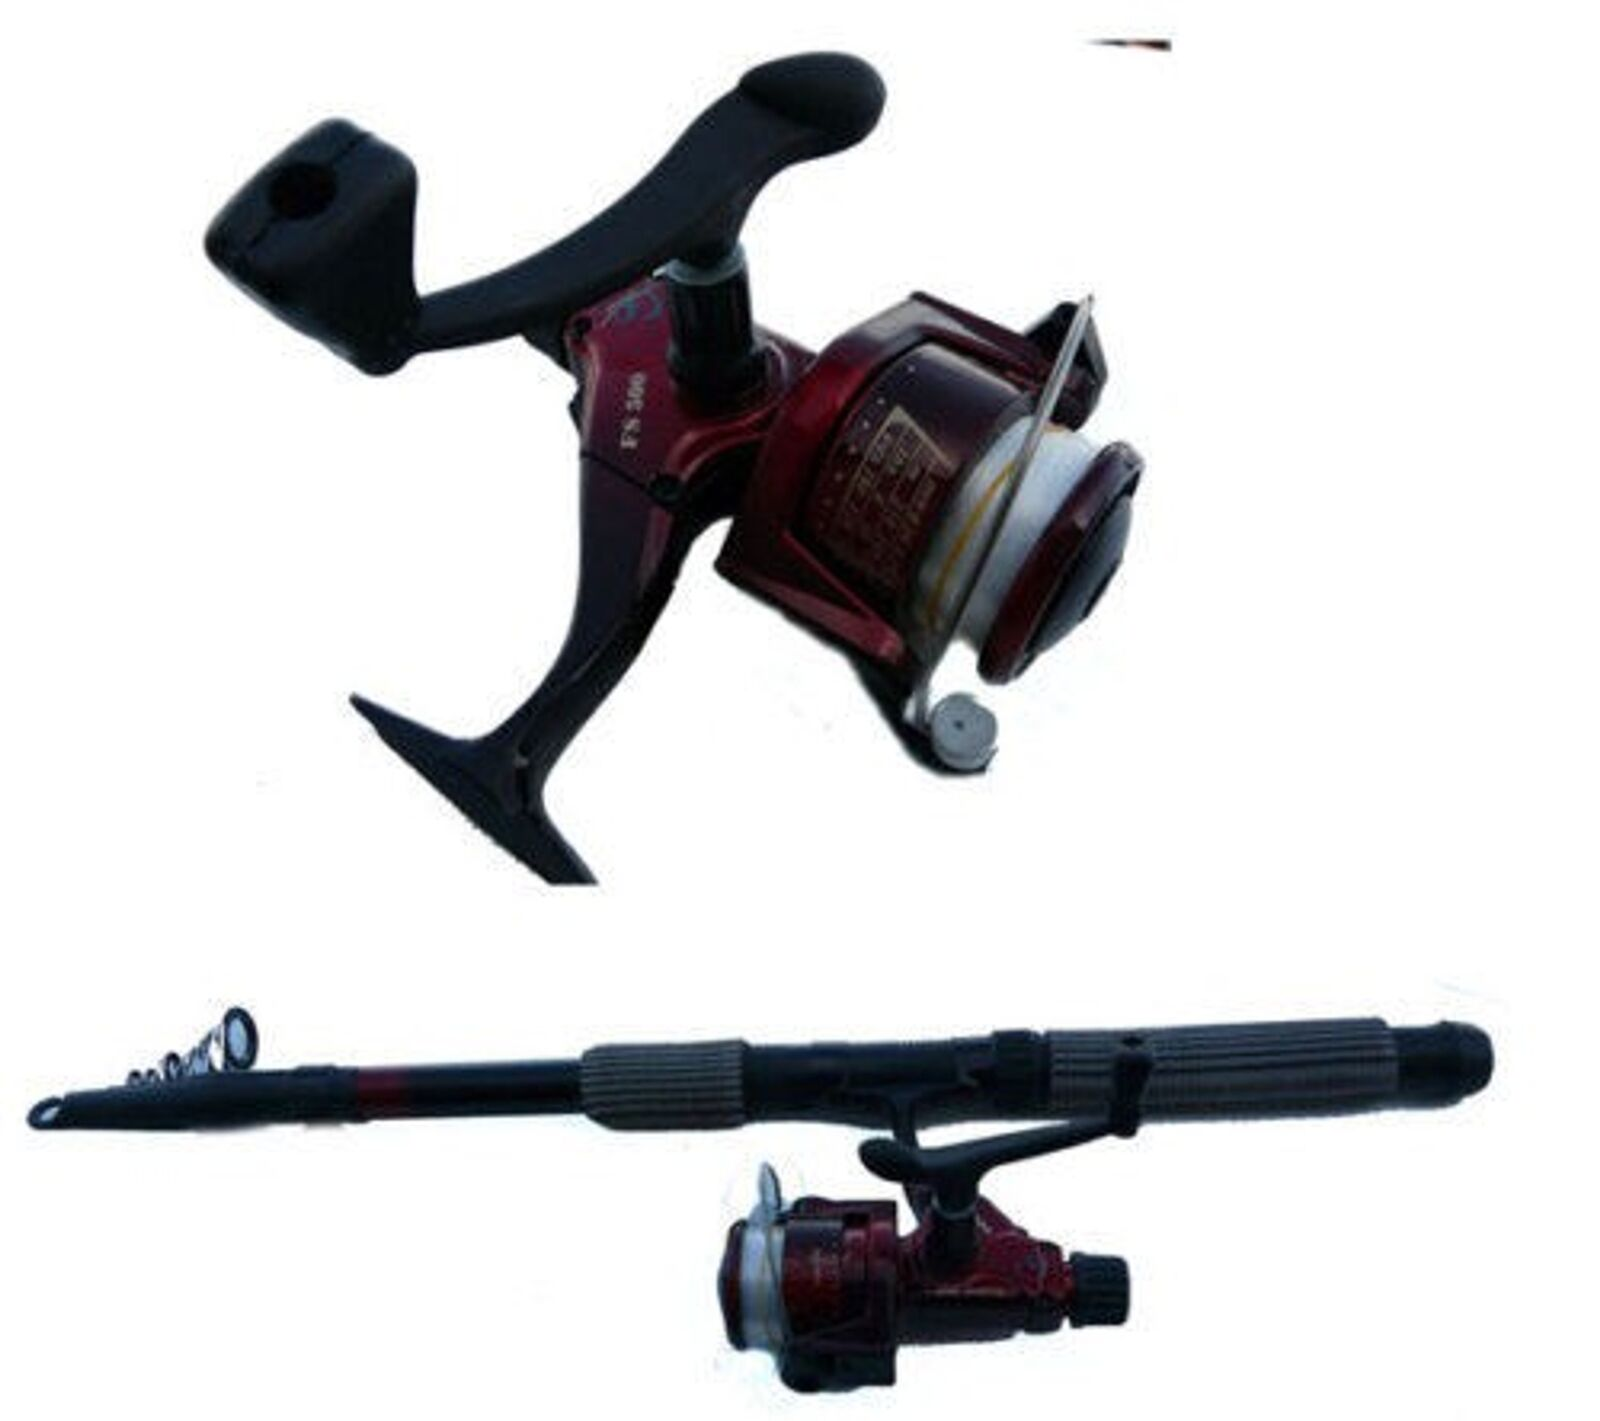 Pesca Set Aus Caña de Rollo con Línea Largo 4.5 4.5 4.5 M + Carrete FS500 b2dc66